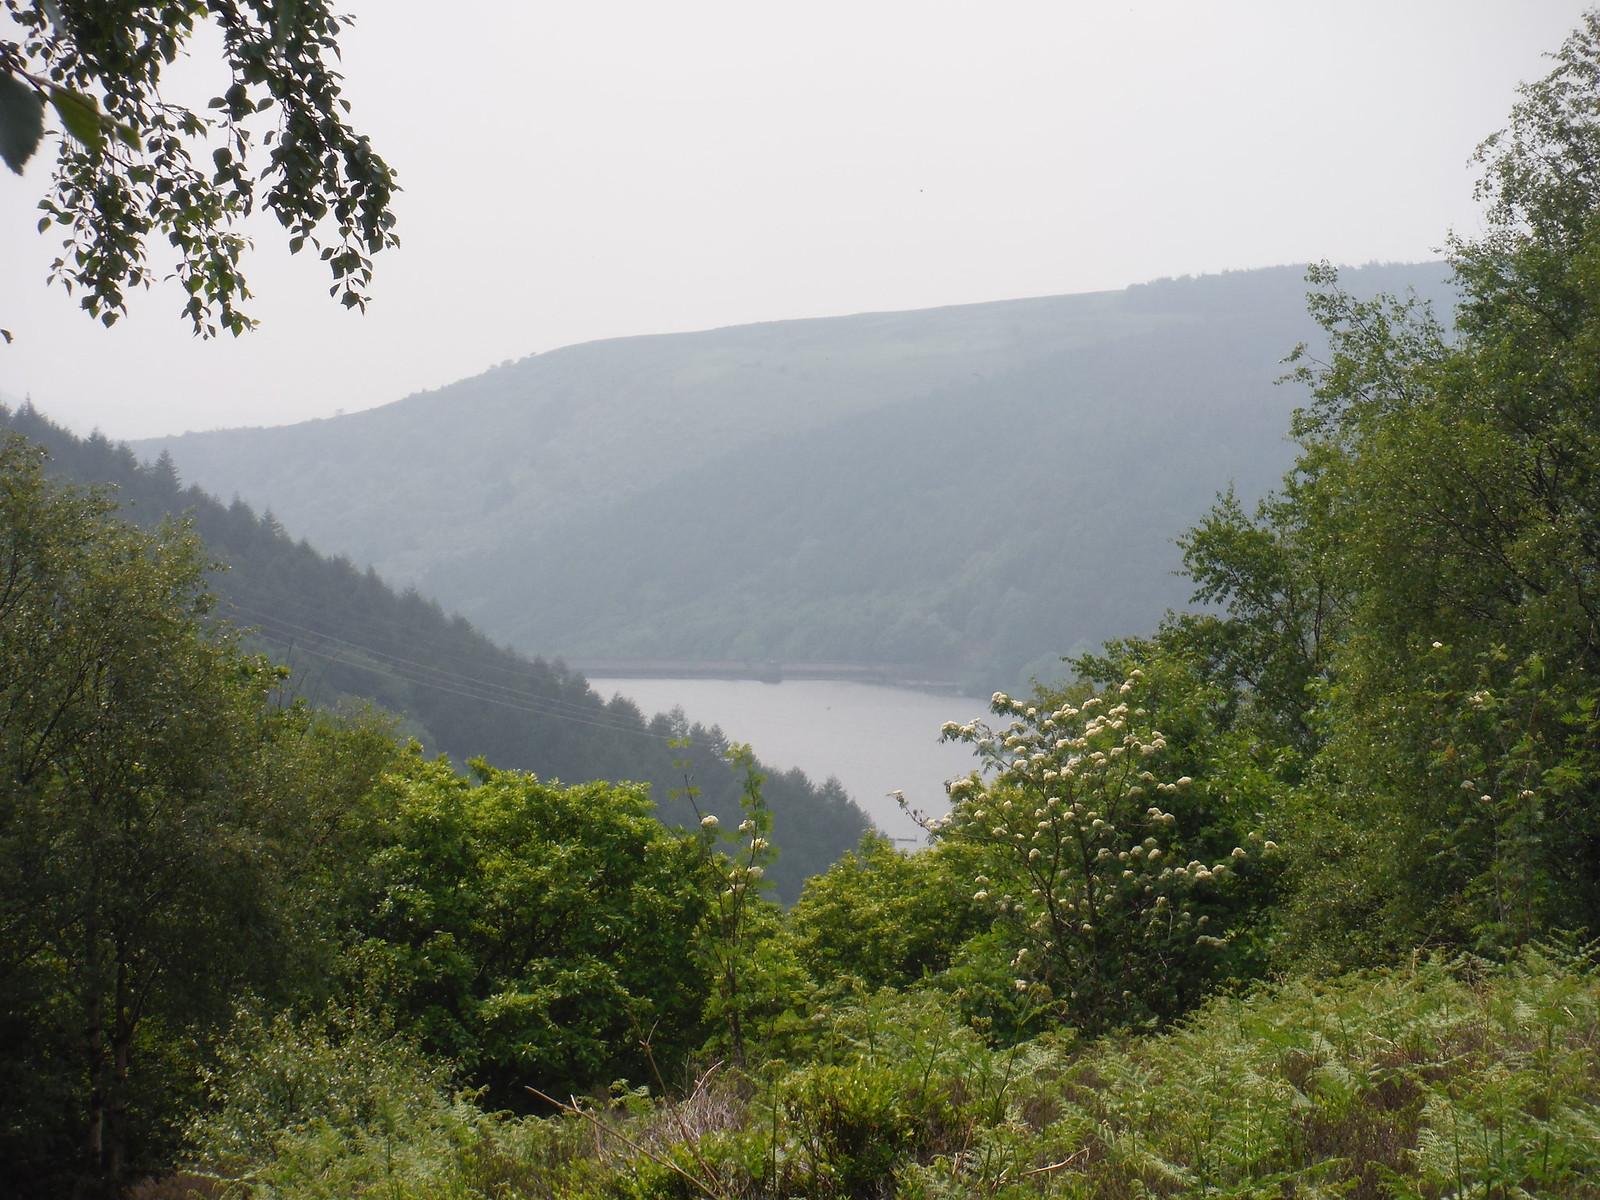 Ladybower Reservoir SWC Walk 266 - Sheffield to Bamford (via Burbage Rocks and Stanage Edge) or to Moscar Lodge [Extension to Ladybower Inn]